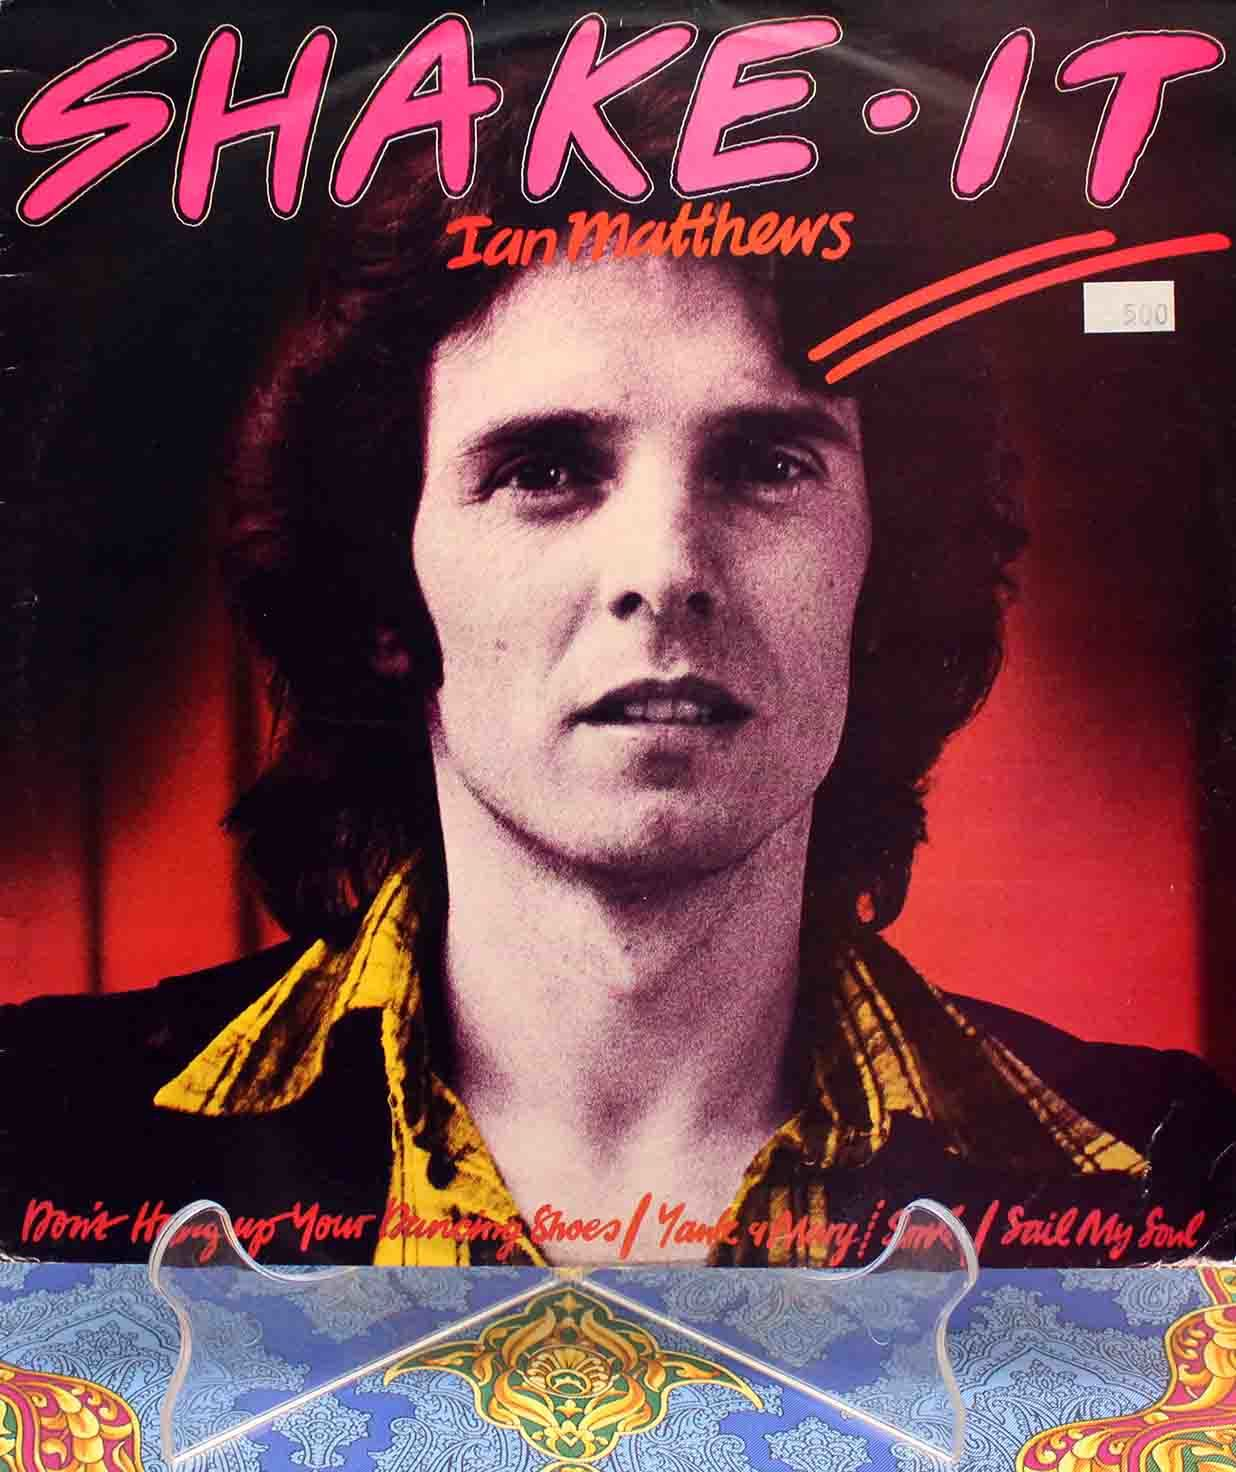 Ian Matthews Shake It 01